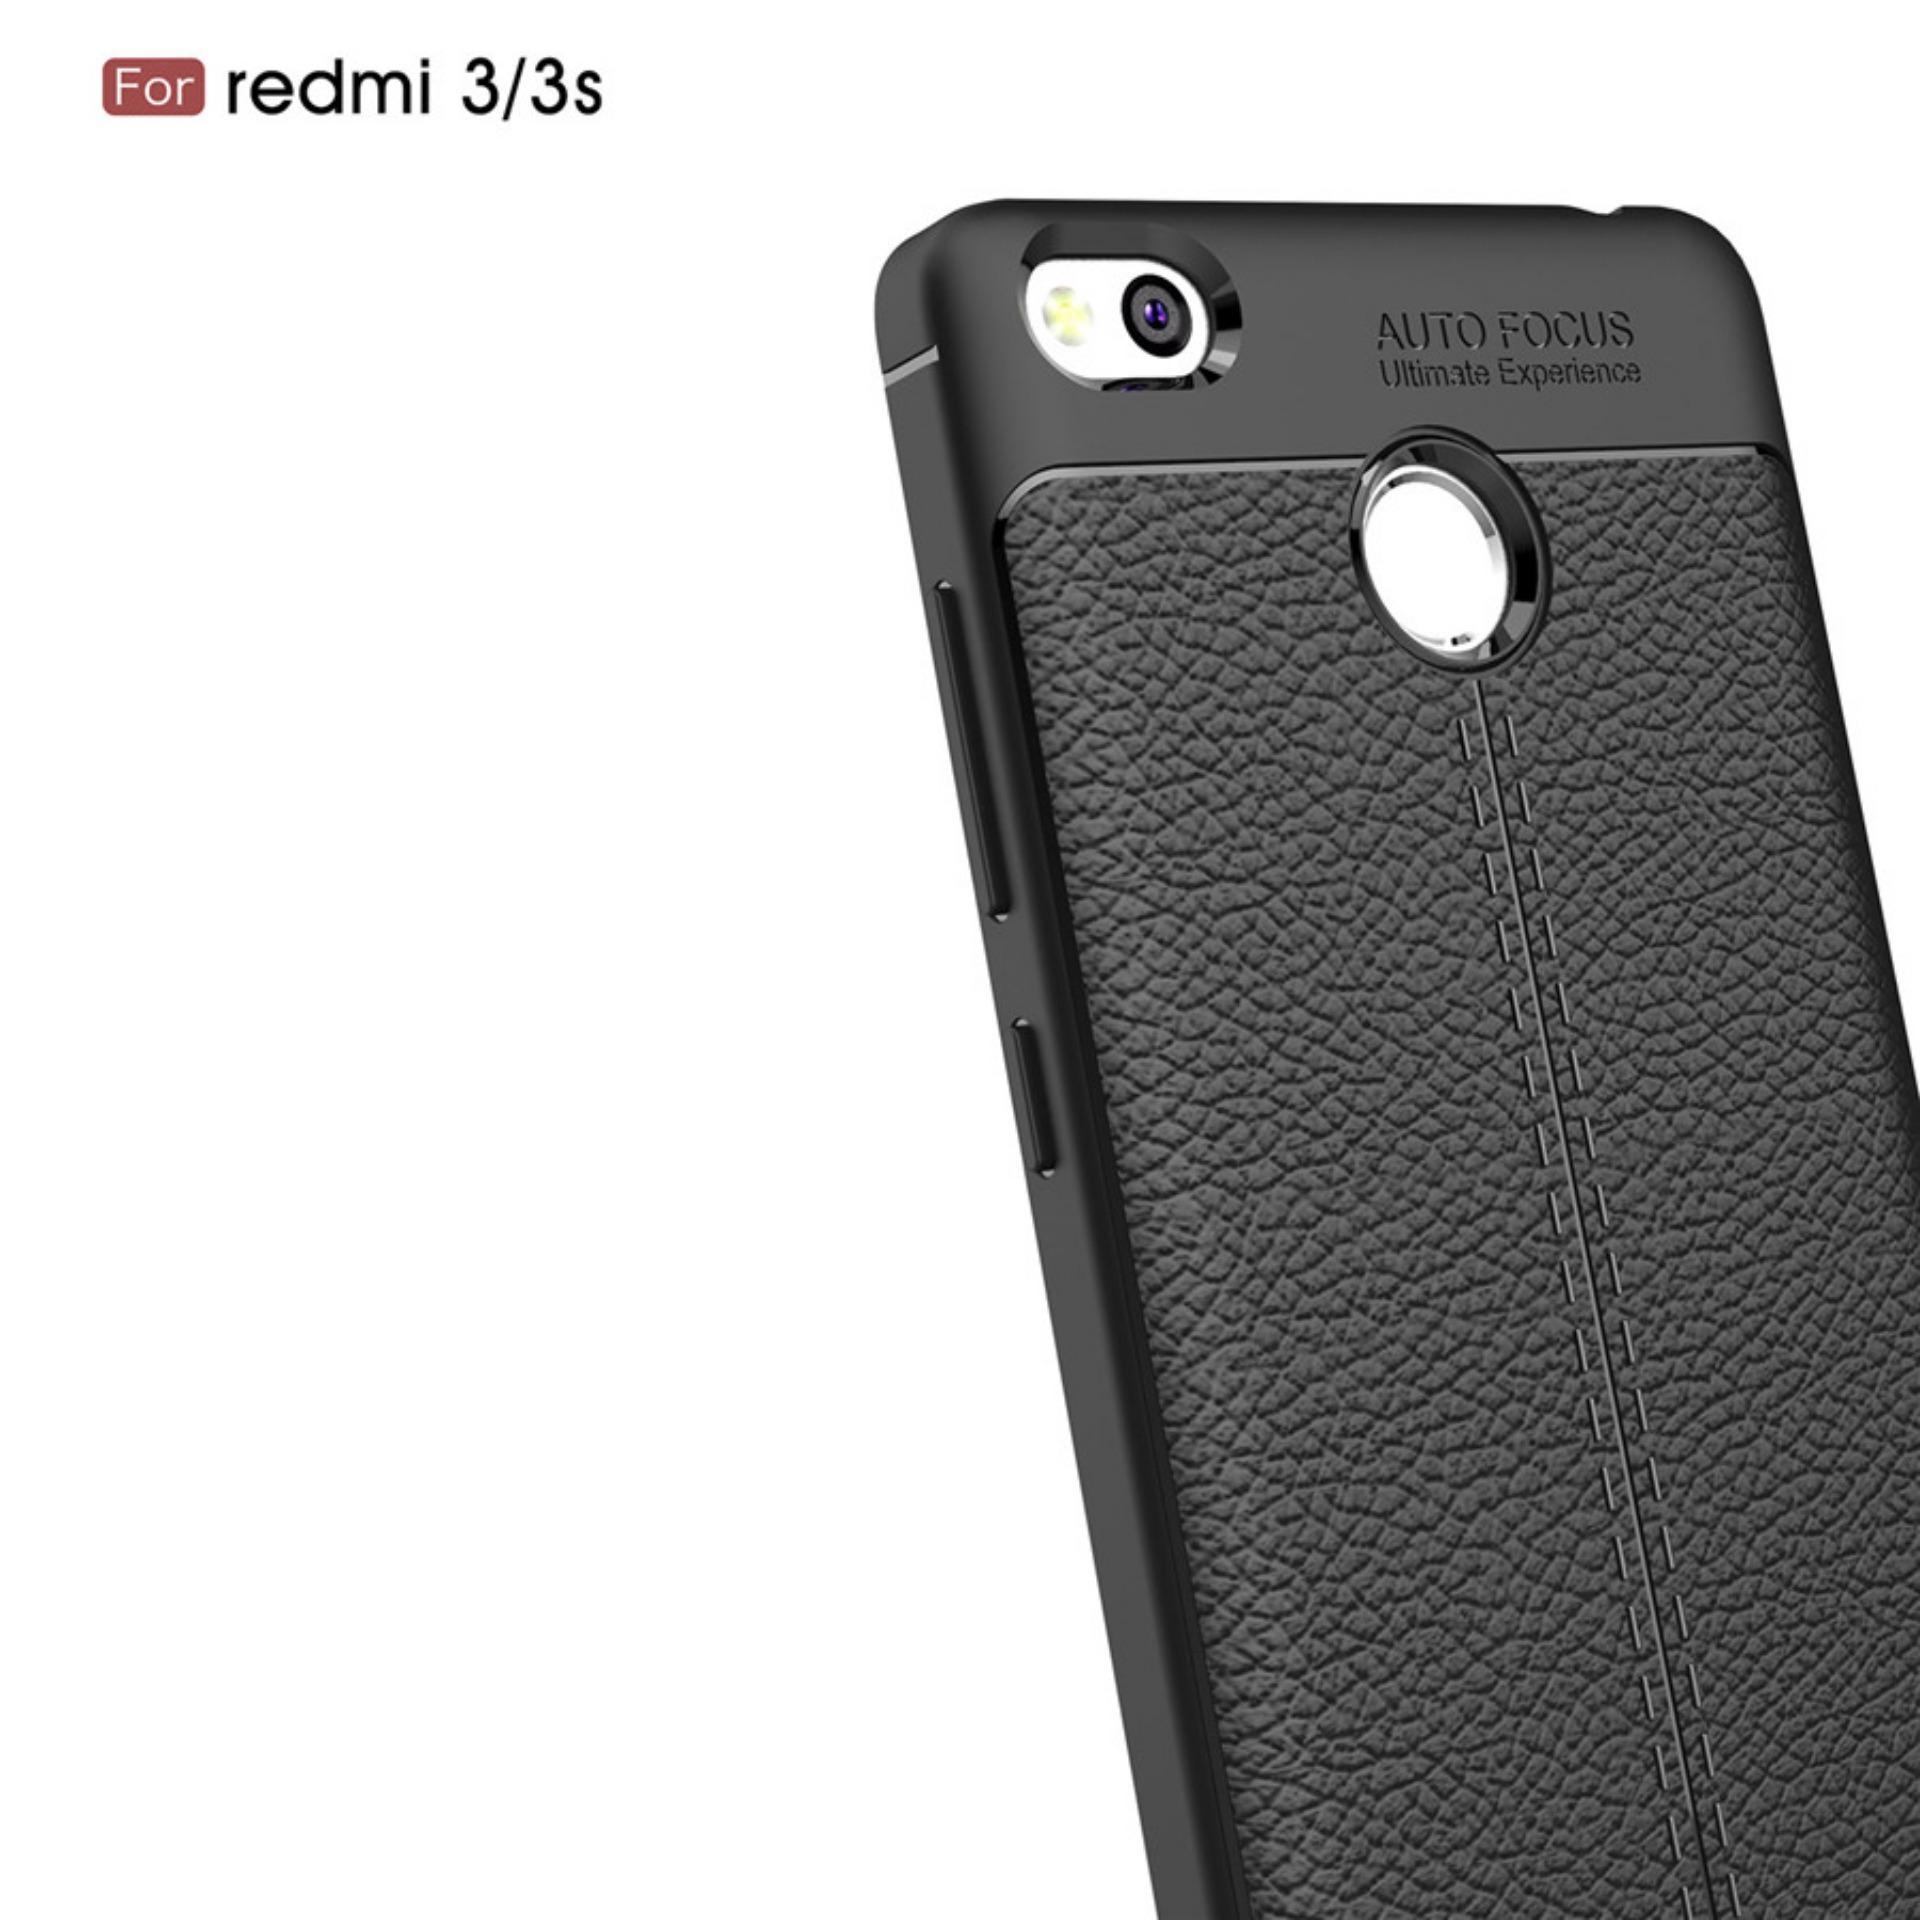 Cek Harga Baru Ambigo Premium Case Xiaomi Redmi 3 Pro 3s Luxury Casing Handphone Back Tempered Glass Series For Black Free Ultrathinblack Ultimate Autofocus Tpu Leather